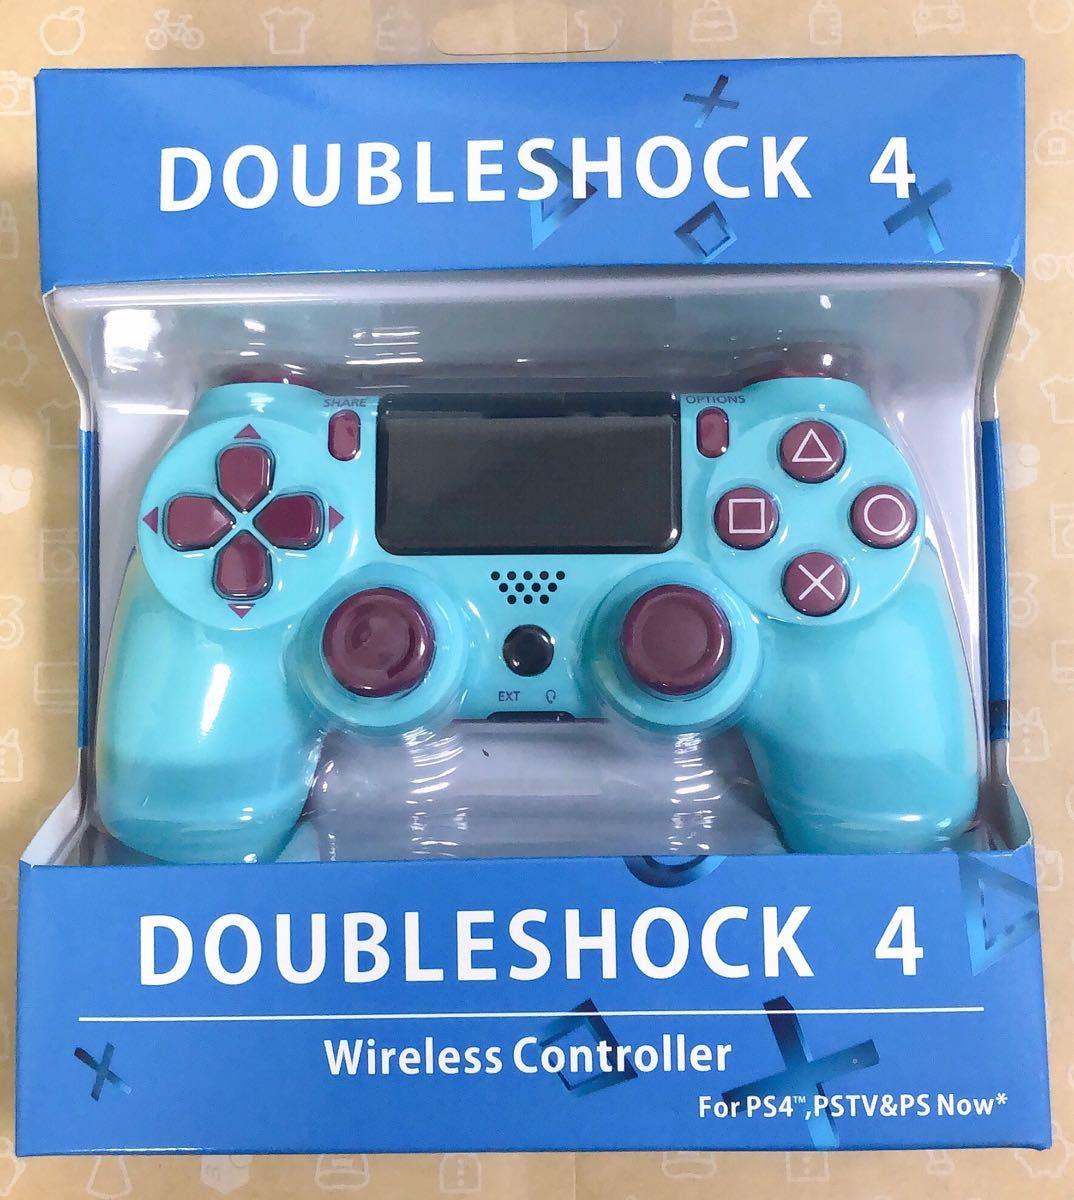 PS4 ワイヤレスコントローラー 高速Bluetooth4.0 充電ケーブル付き